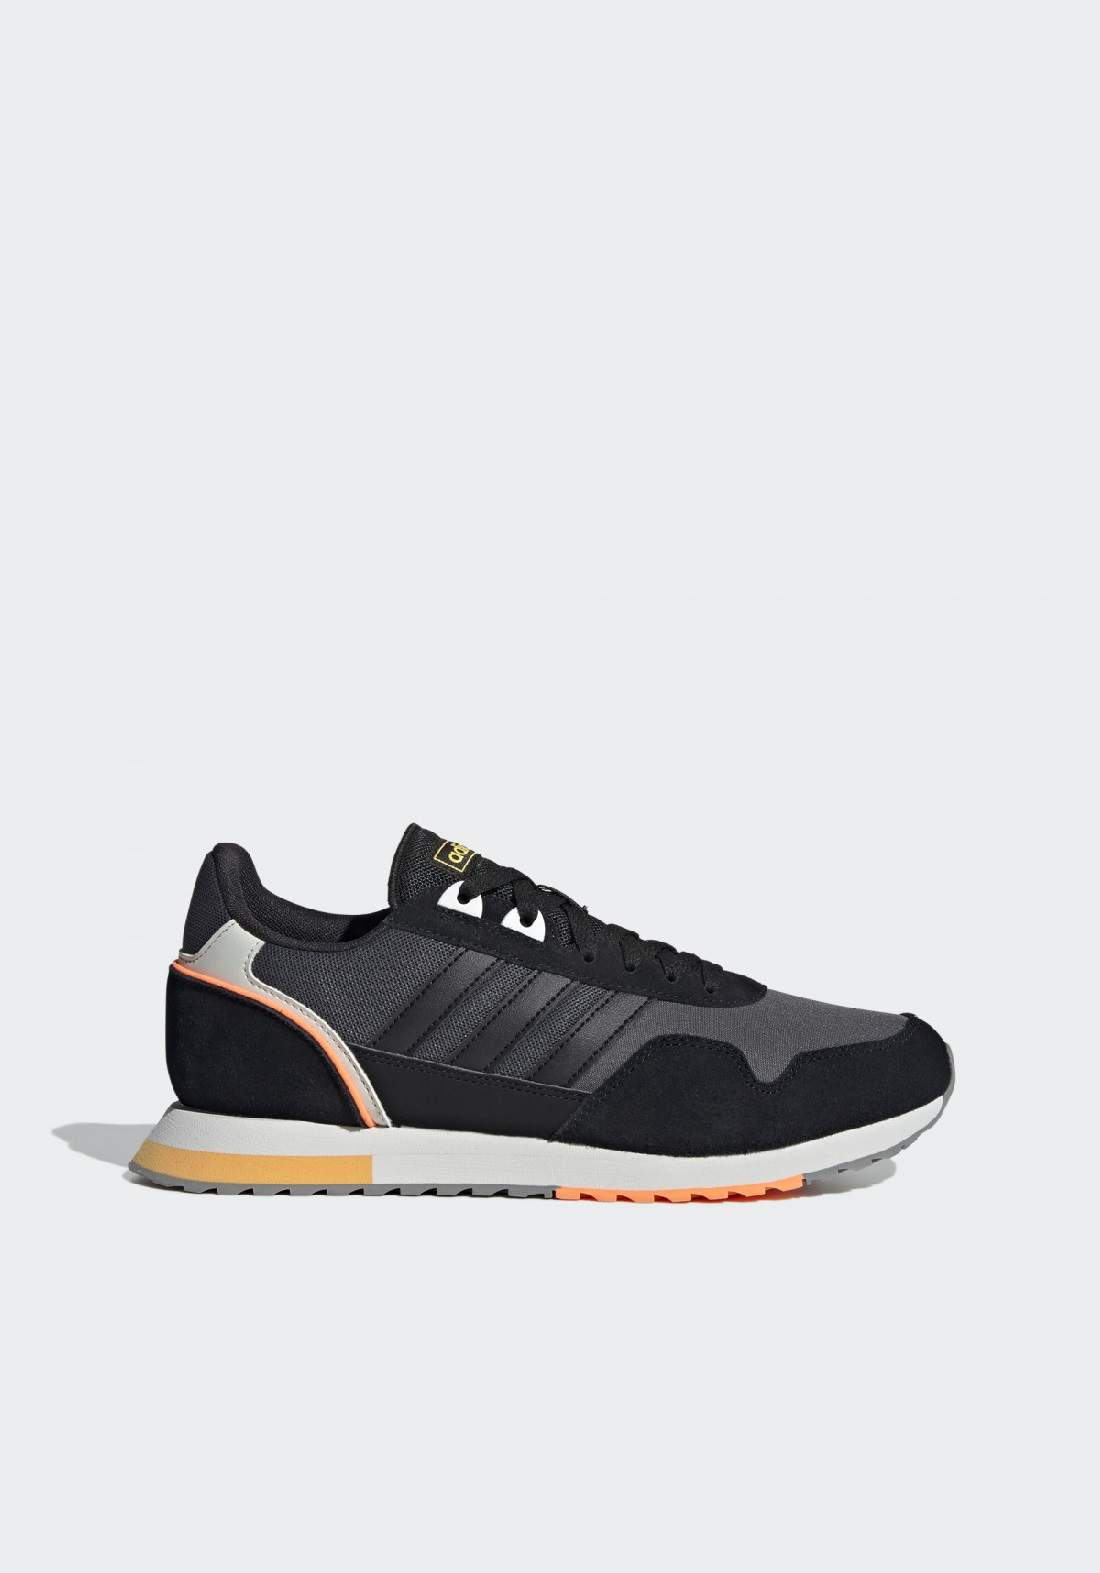 Adidas حذاء رجالي رياضي متعدد الالوان من